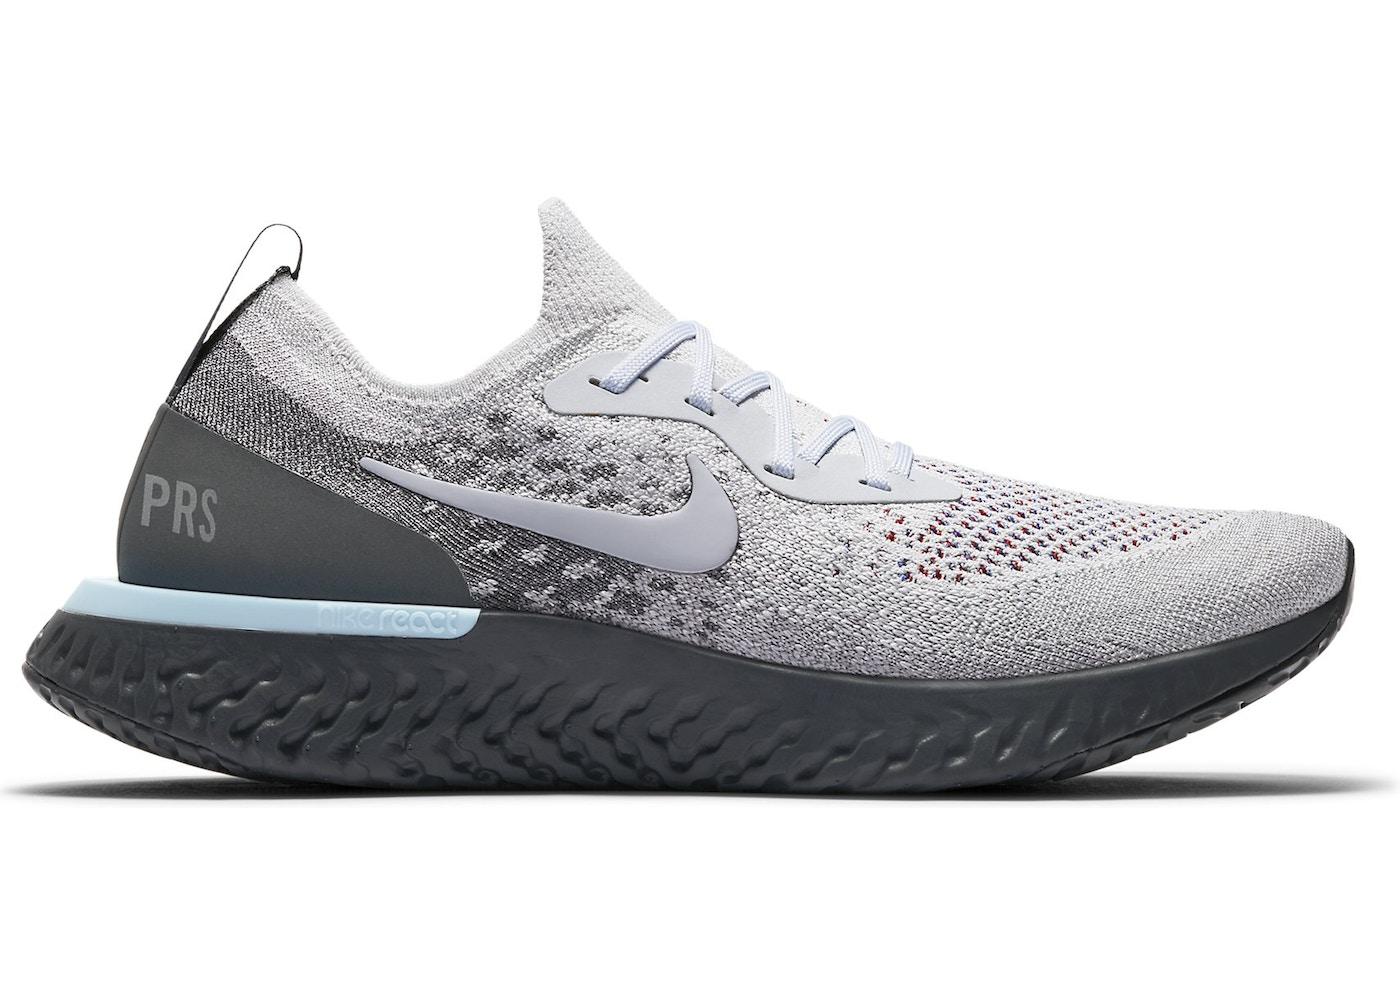 8964c5f5cf24 Nike Epic React Flyknit Paris - AV7013-200